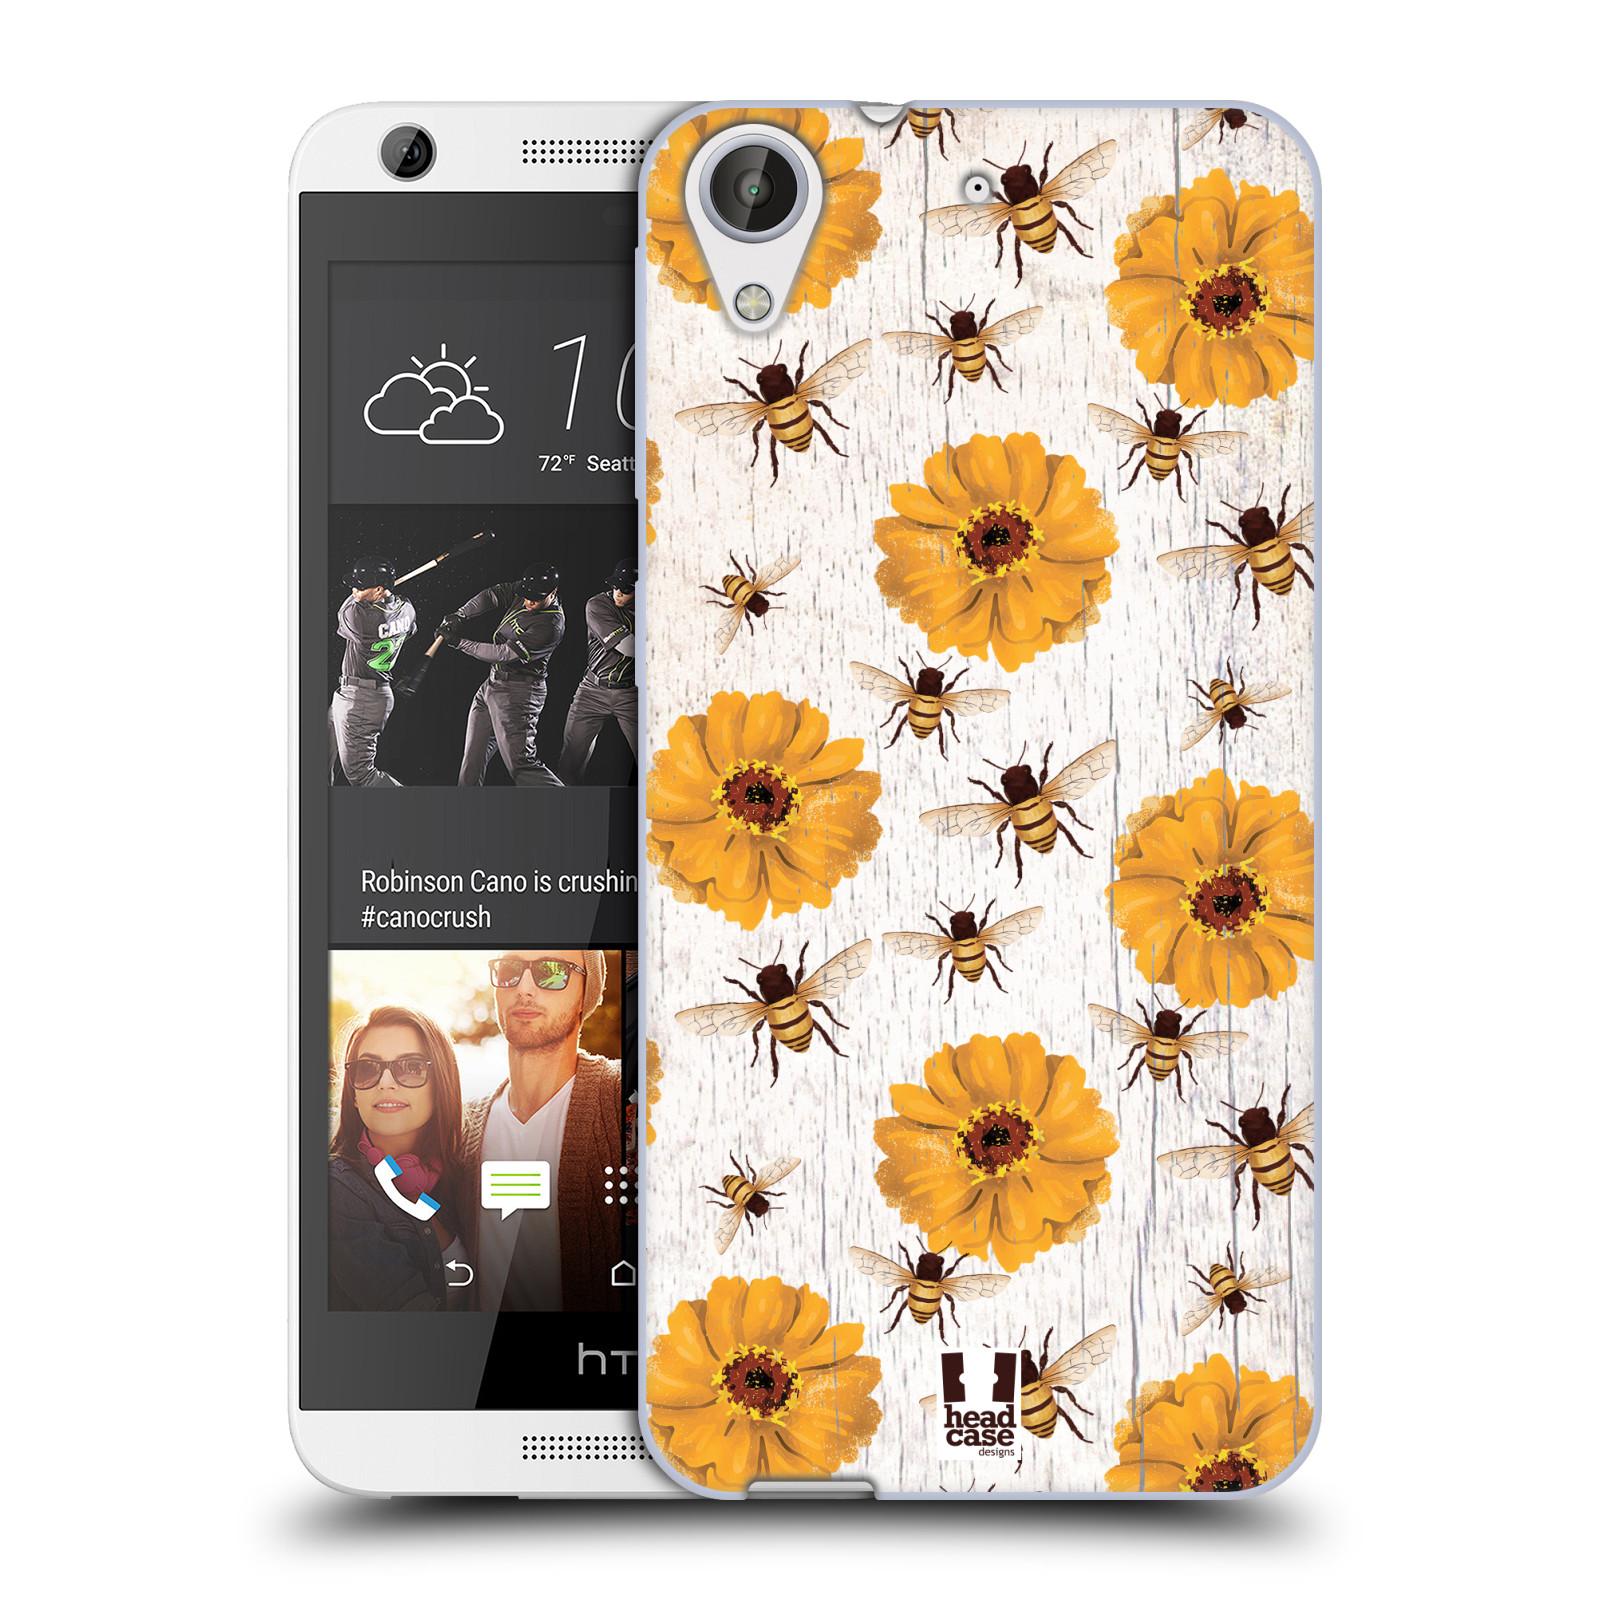 Silikonové pouzdro na mobil HTC Desire 626 / 626G HEAD CASE LIFE IN THE COUNTRY ZINNIAS